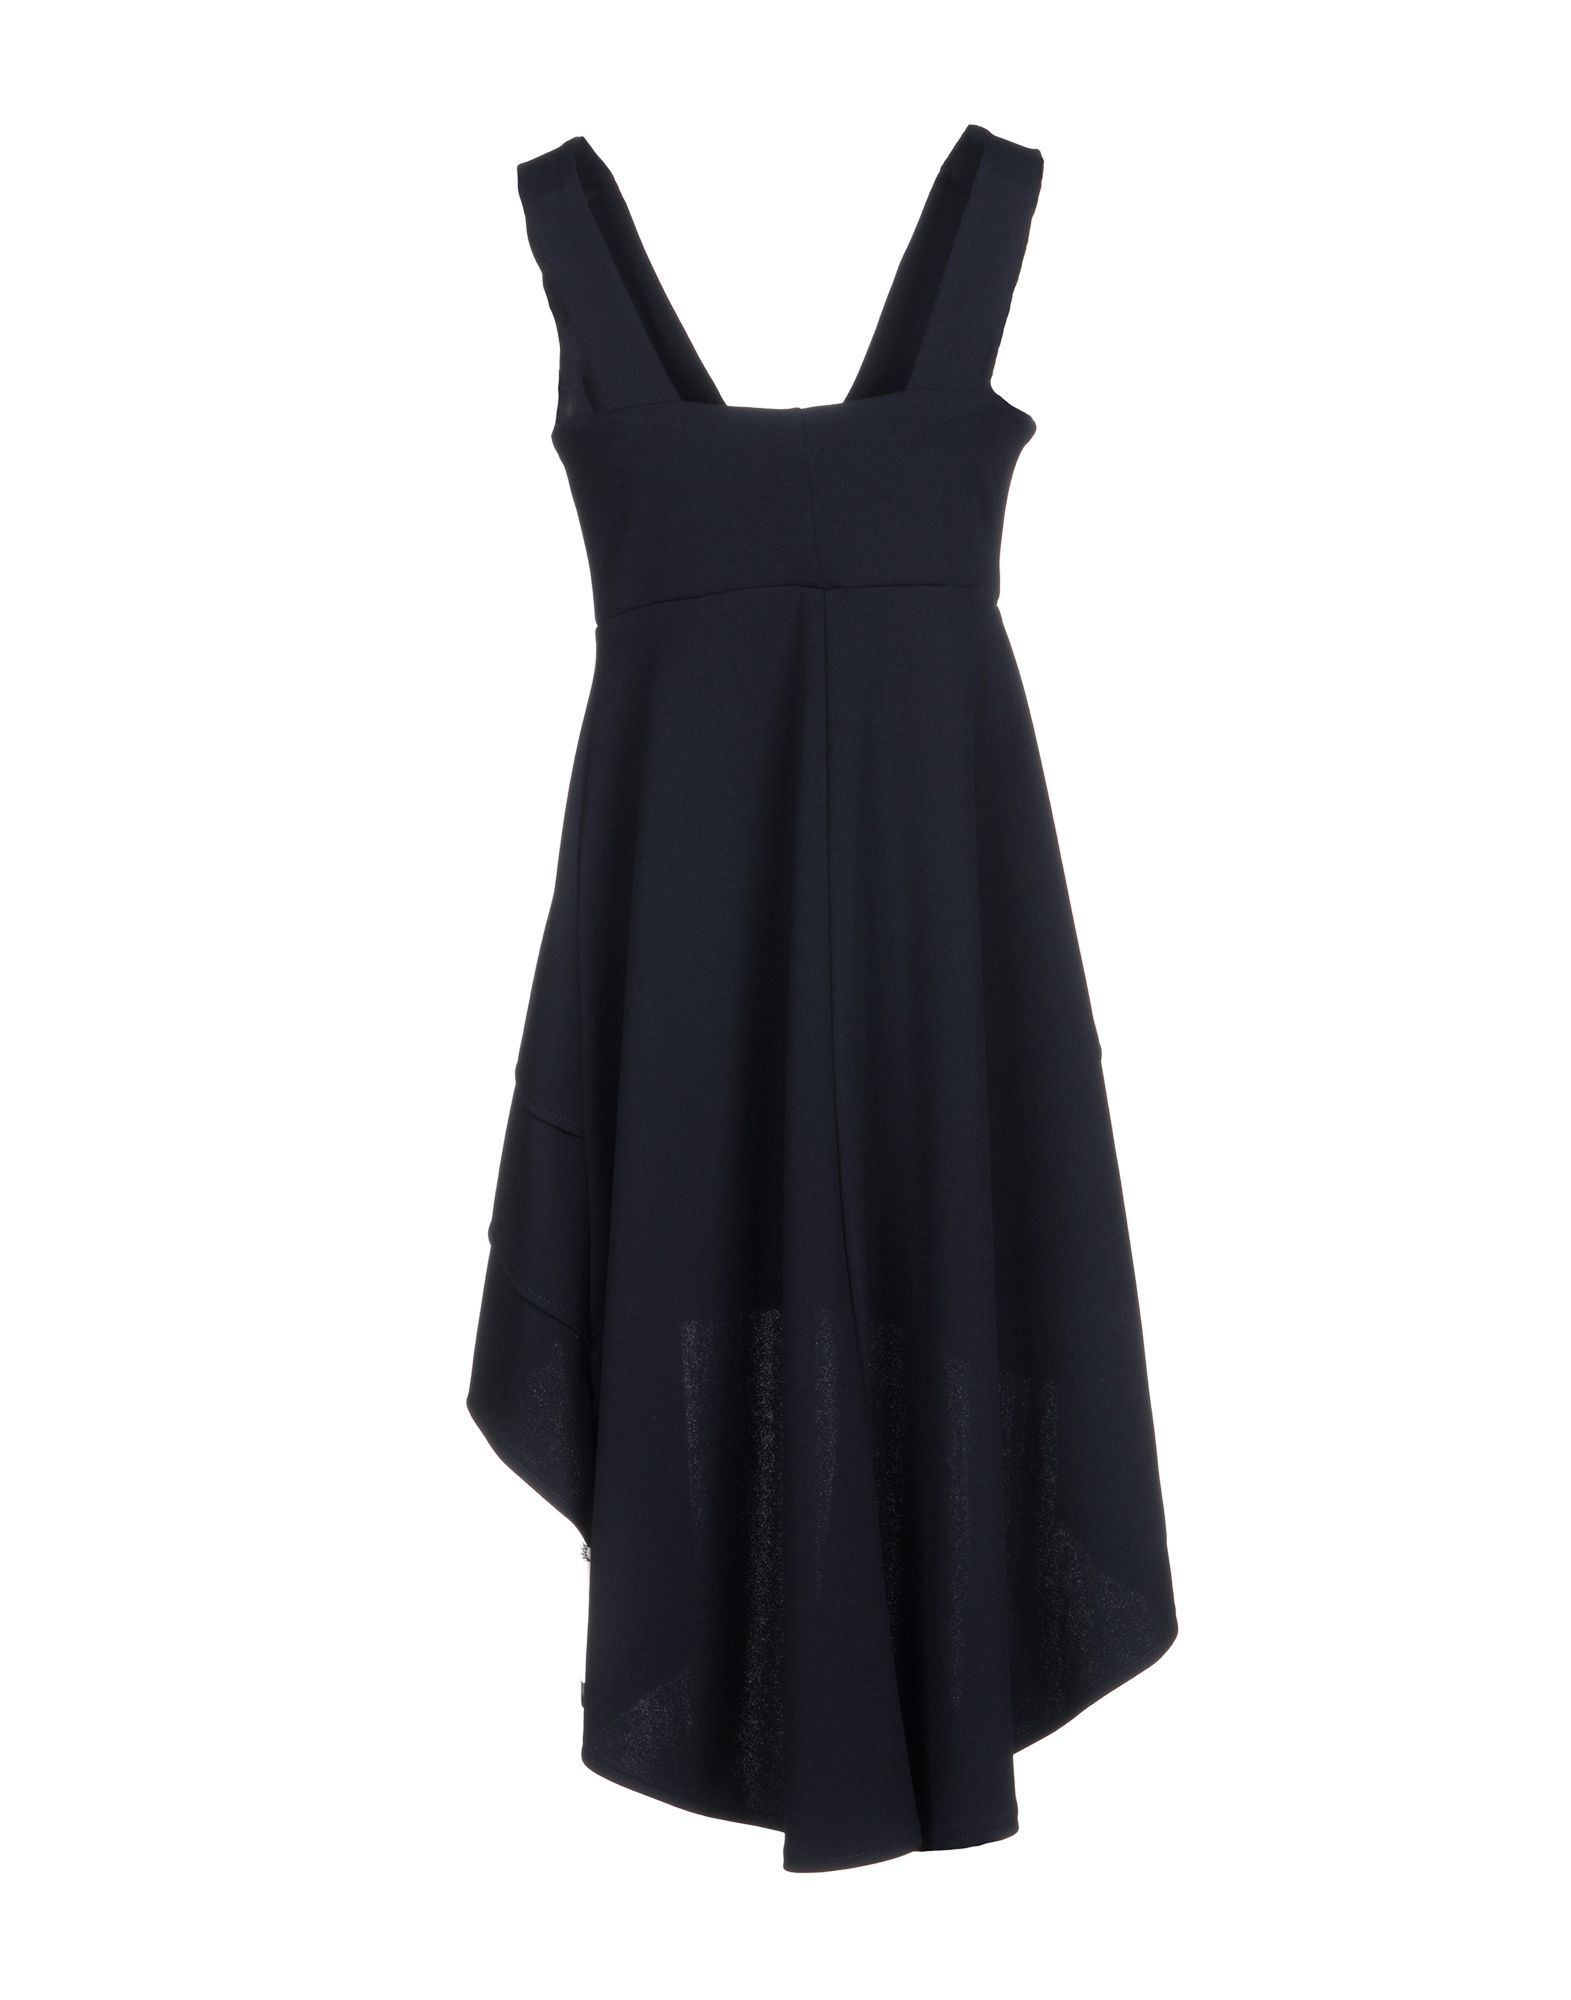 Vanessa Scott Dark Blue Dress